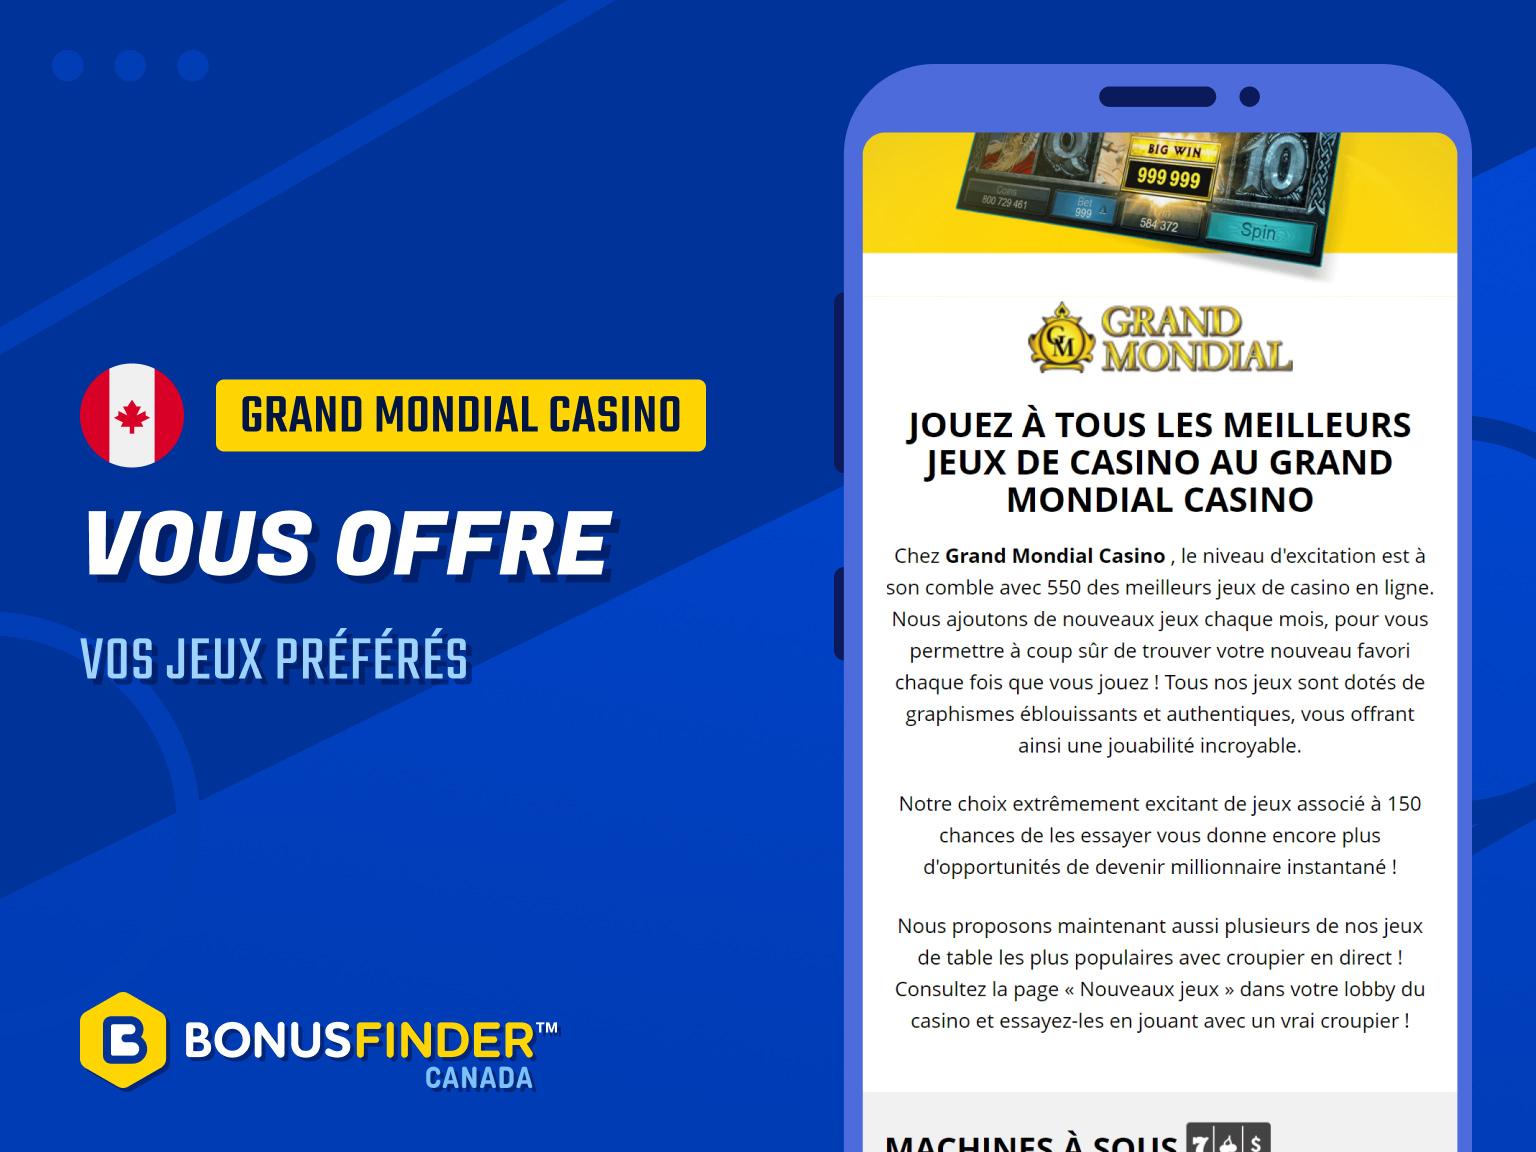 grand mondial casino jeux (2)